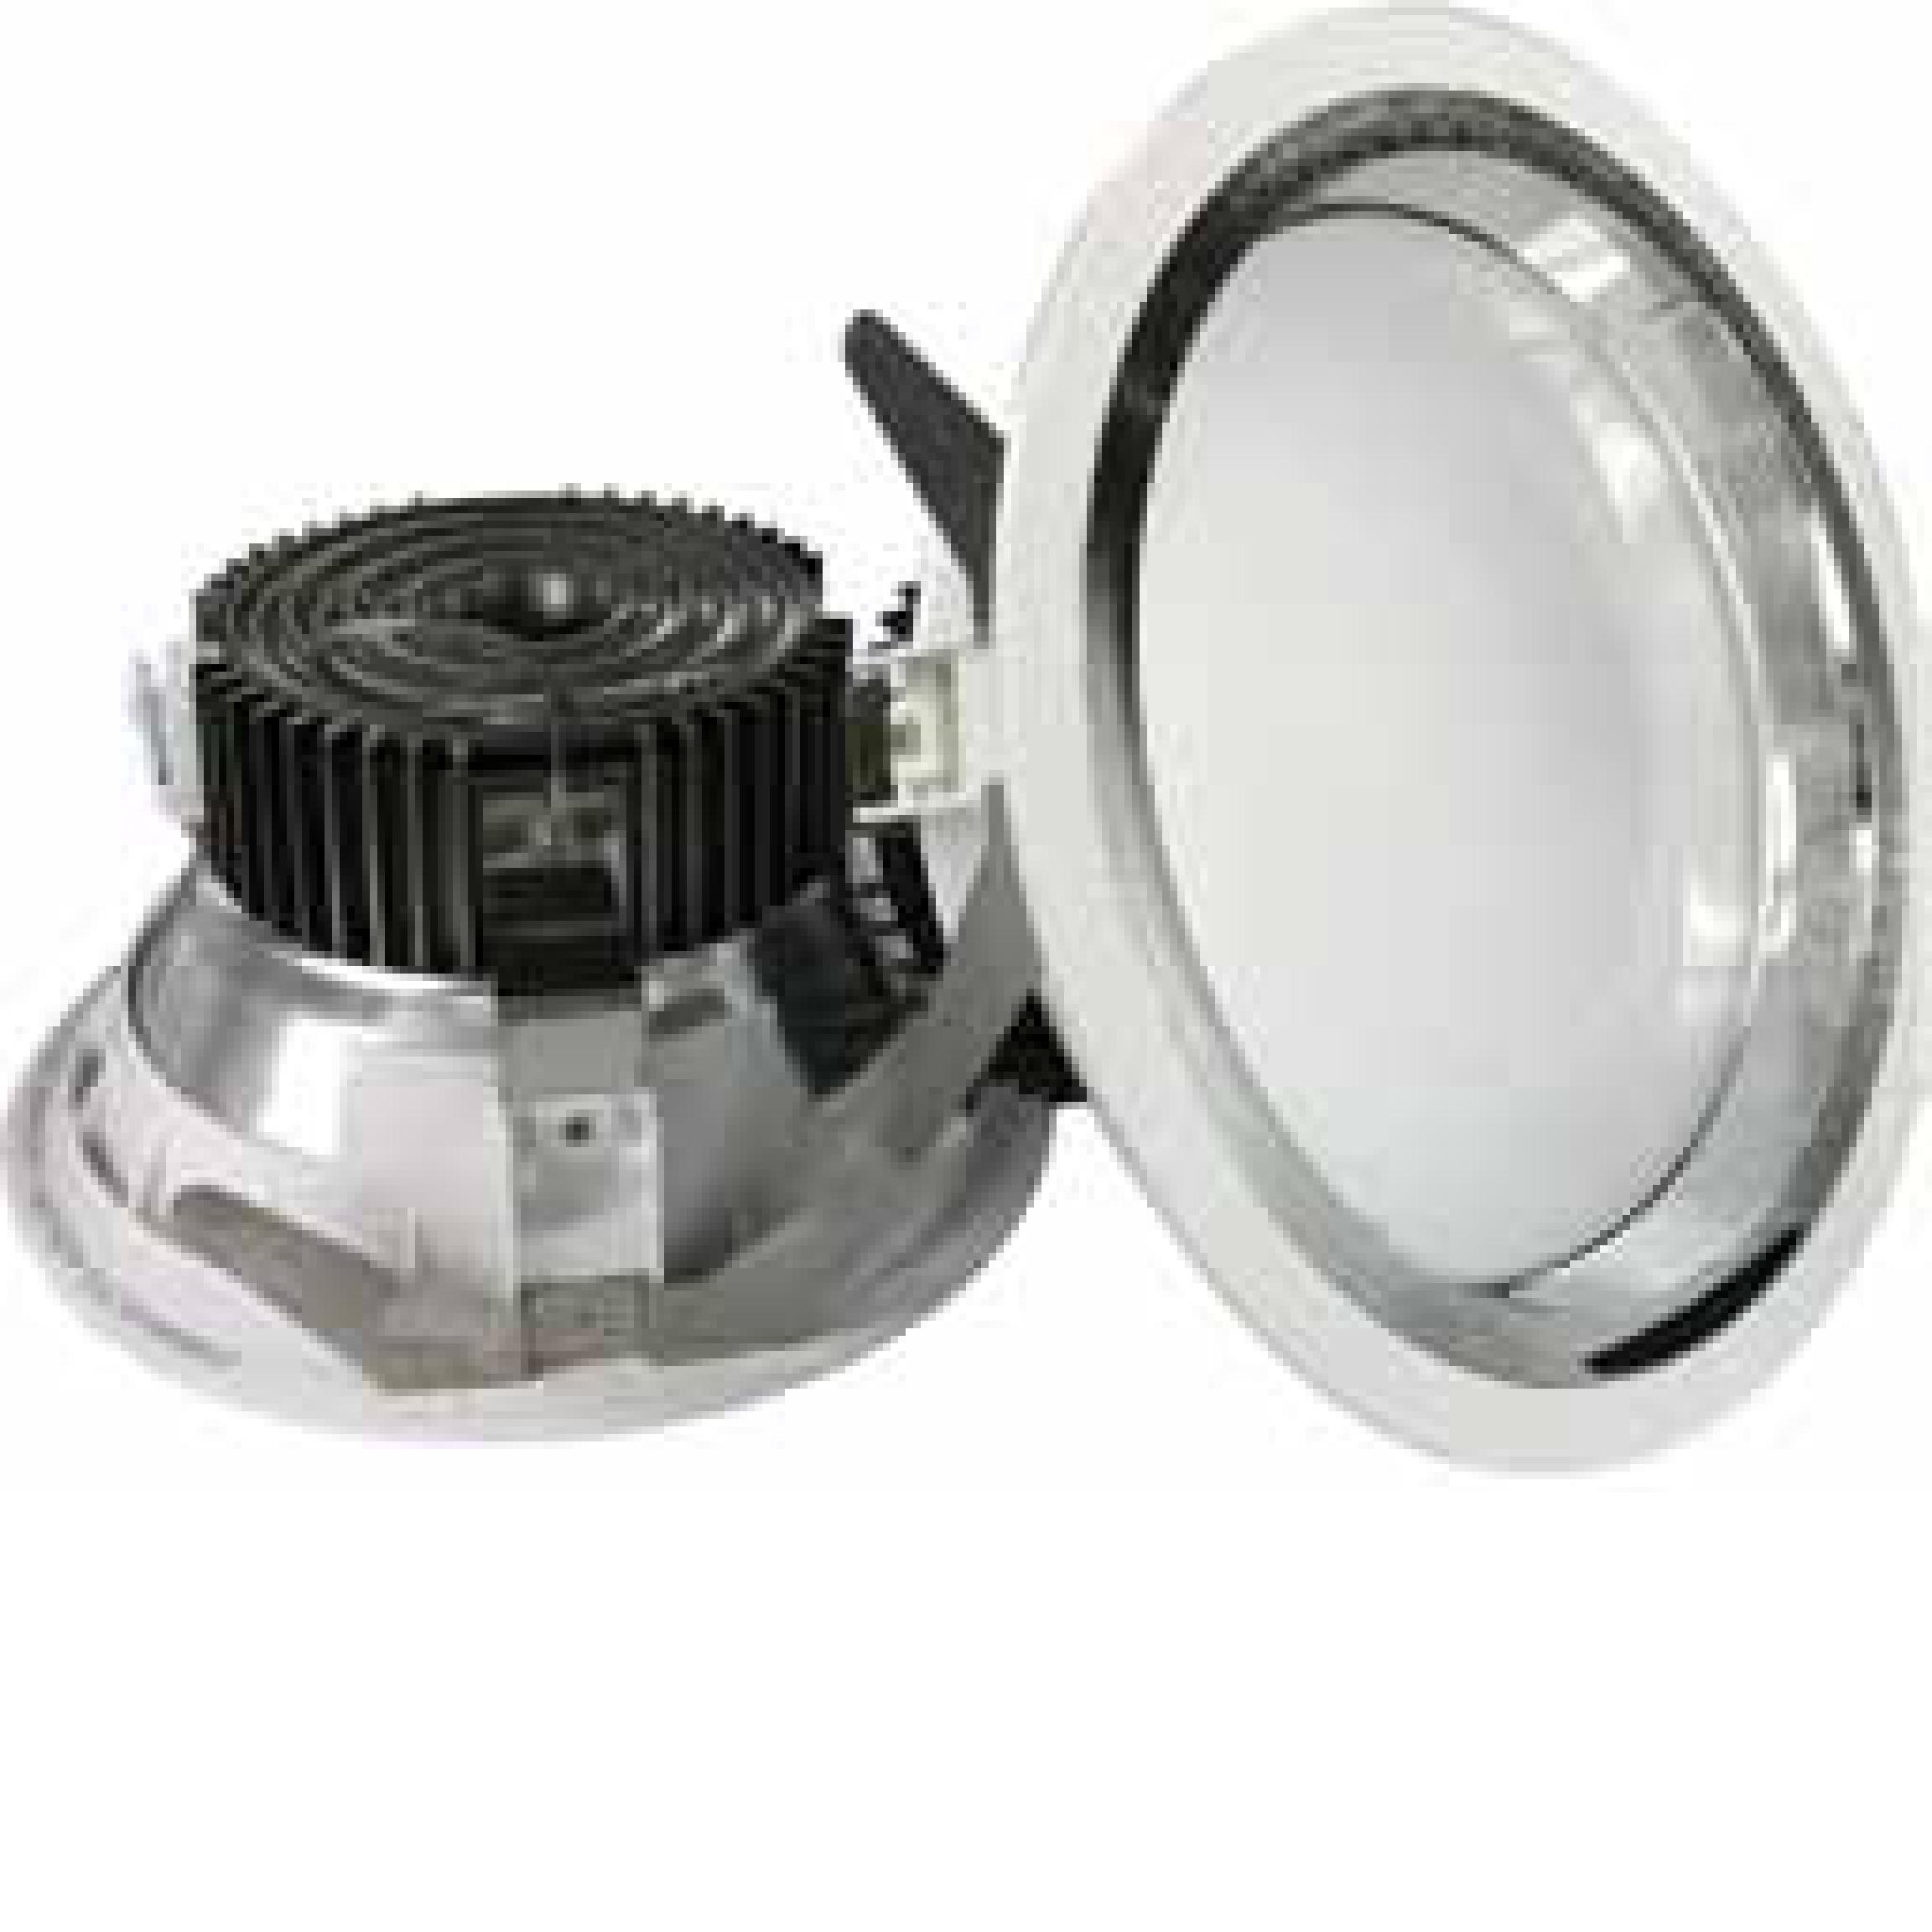 Maxibright LED G24 Downlight - 15W